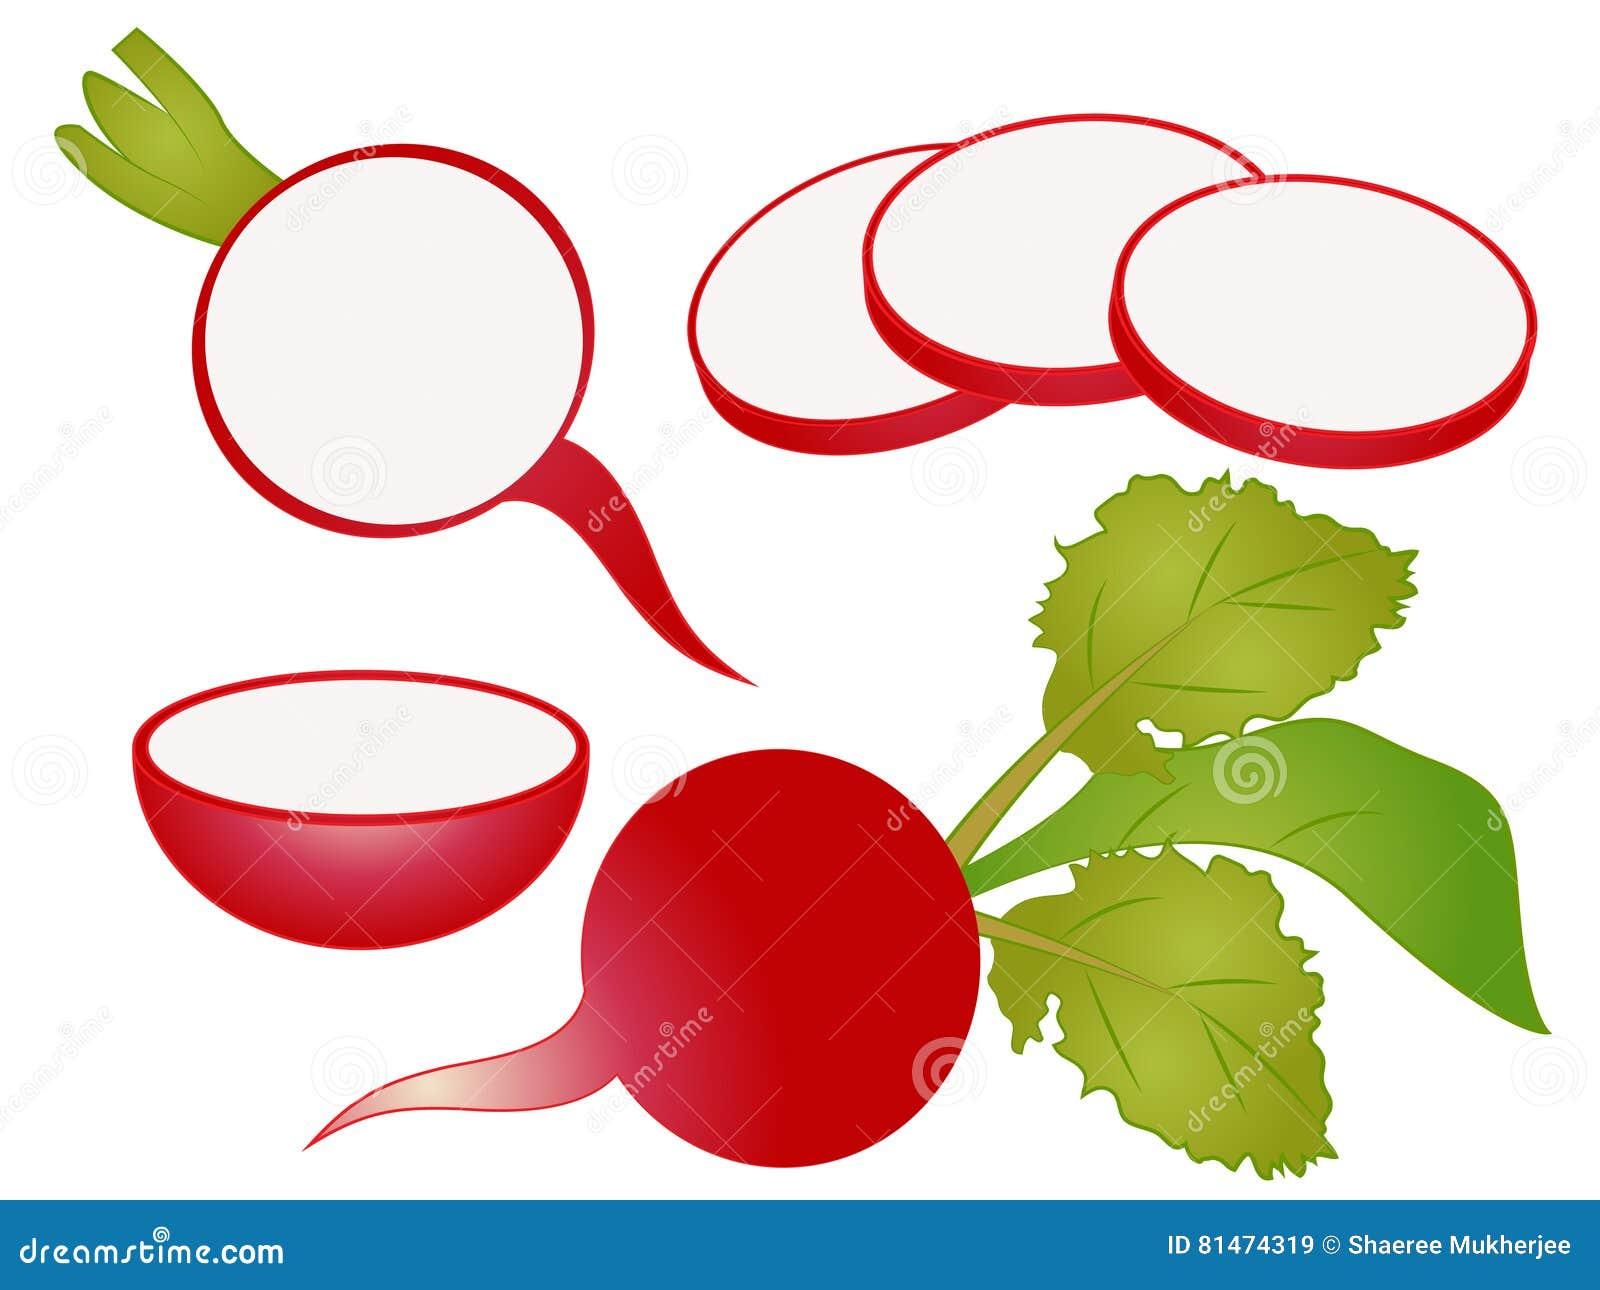 cartoon radish clipart stock vector illustration of vector 81474319 rh dreamstime com radish image clipart radish plant clipart